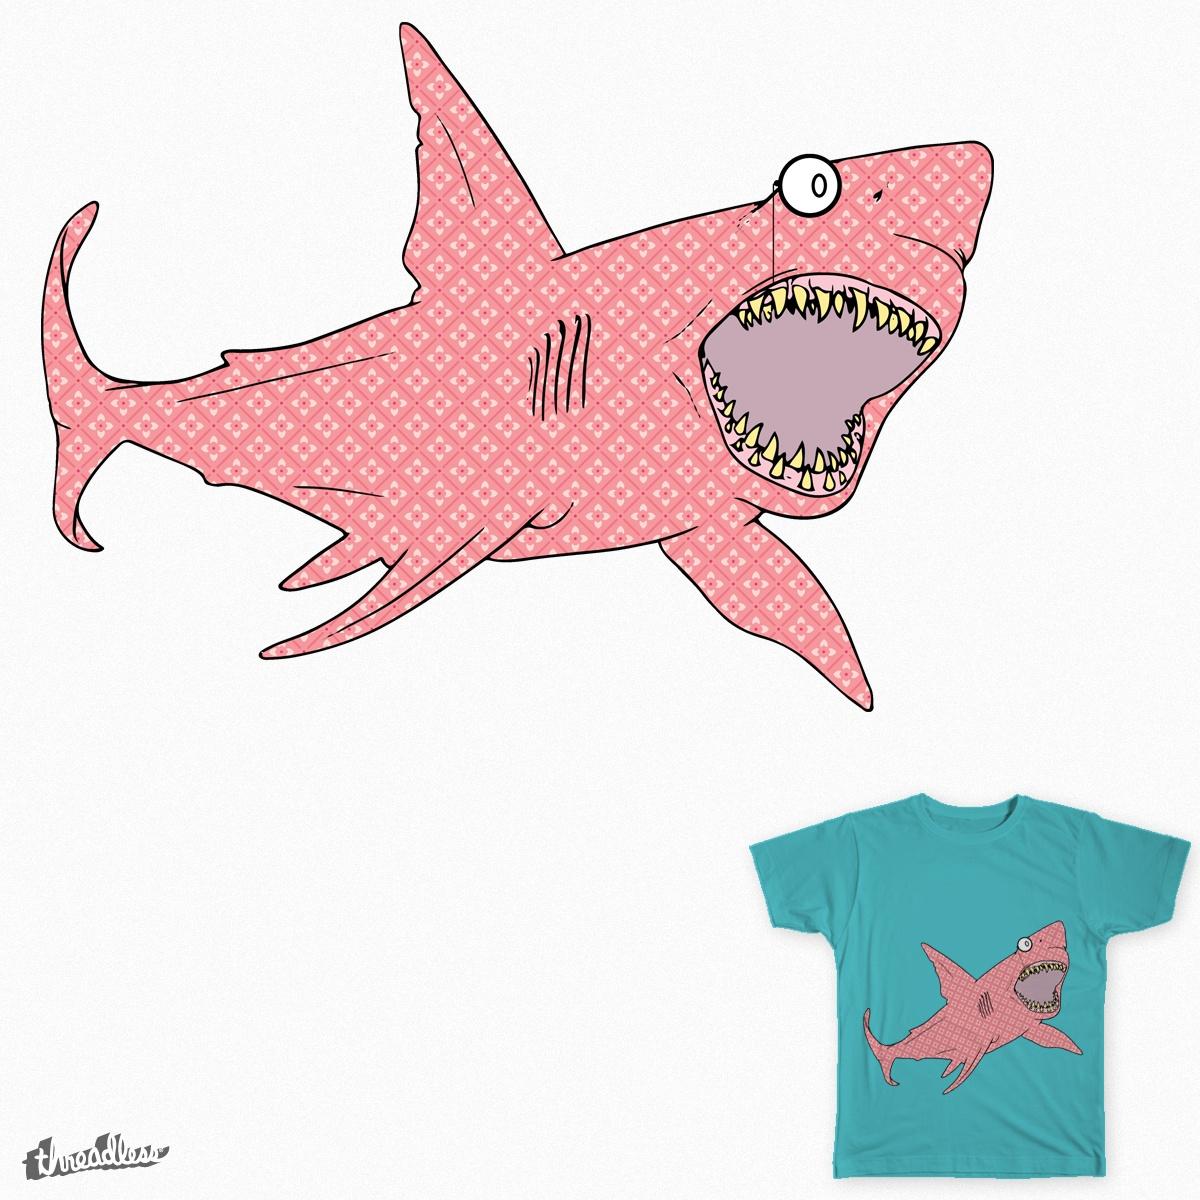 Sharkgent by jumbogiant21 on Threadless